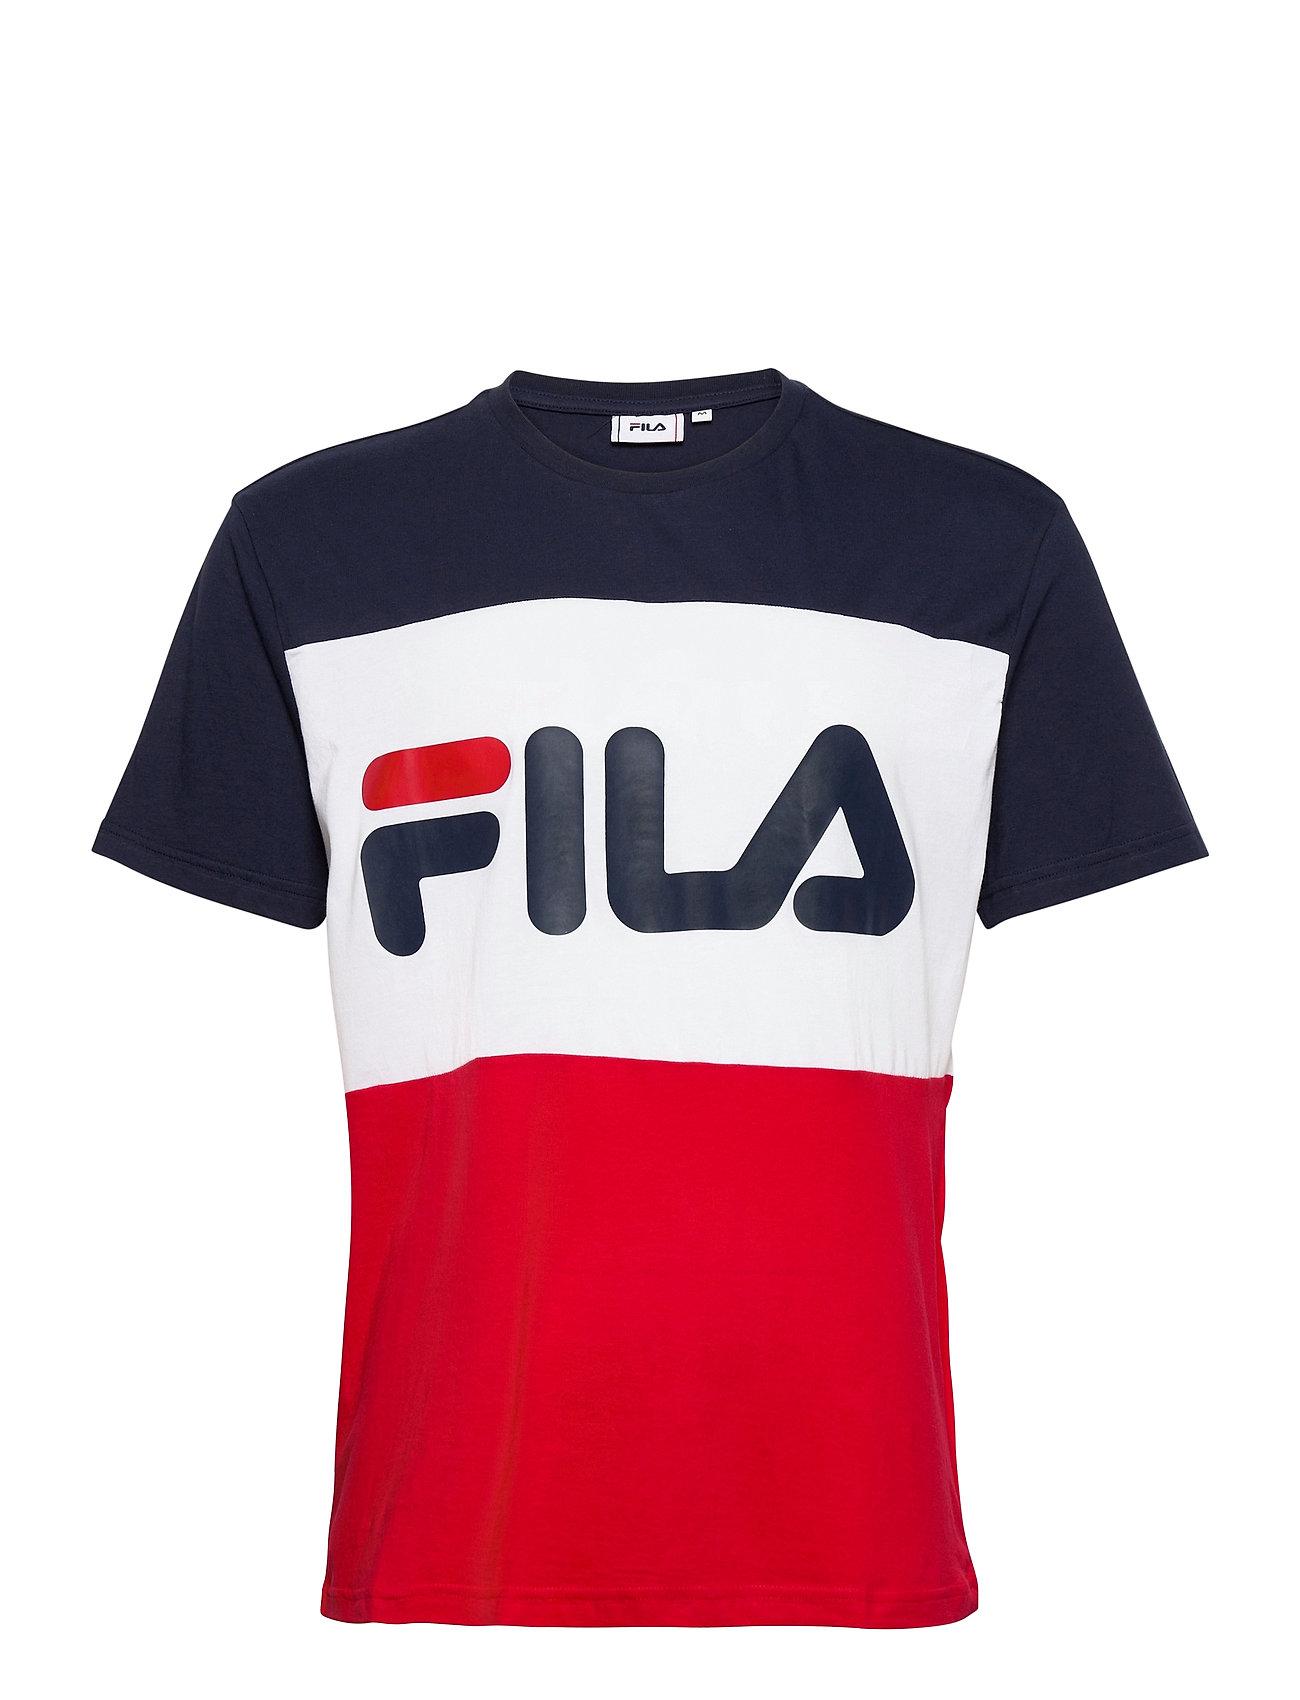 Image of Day Tee T-shirt Multi/mønstret FILA (3448366653)